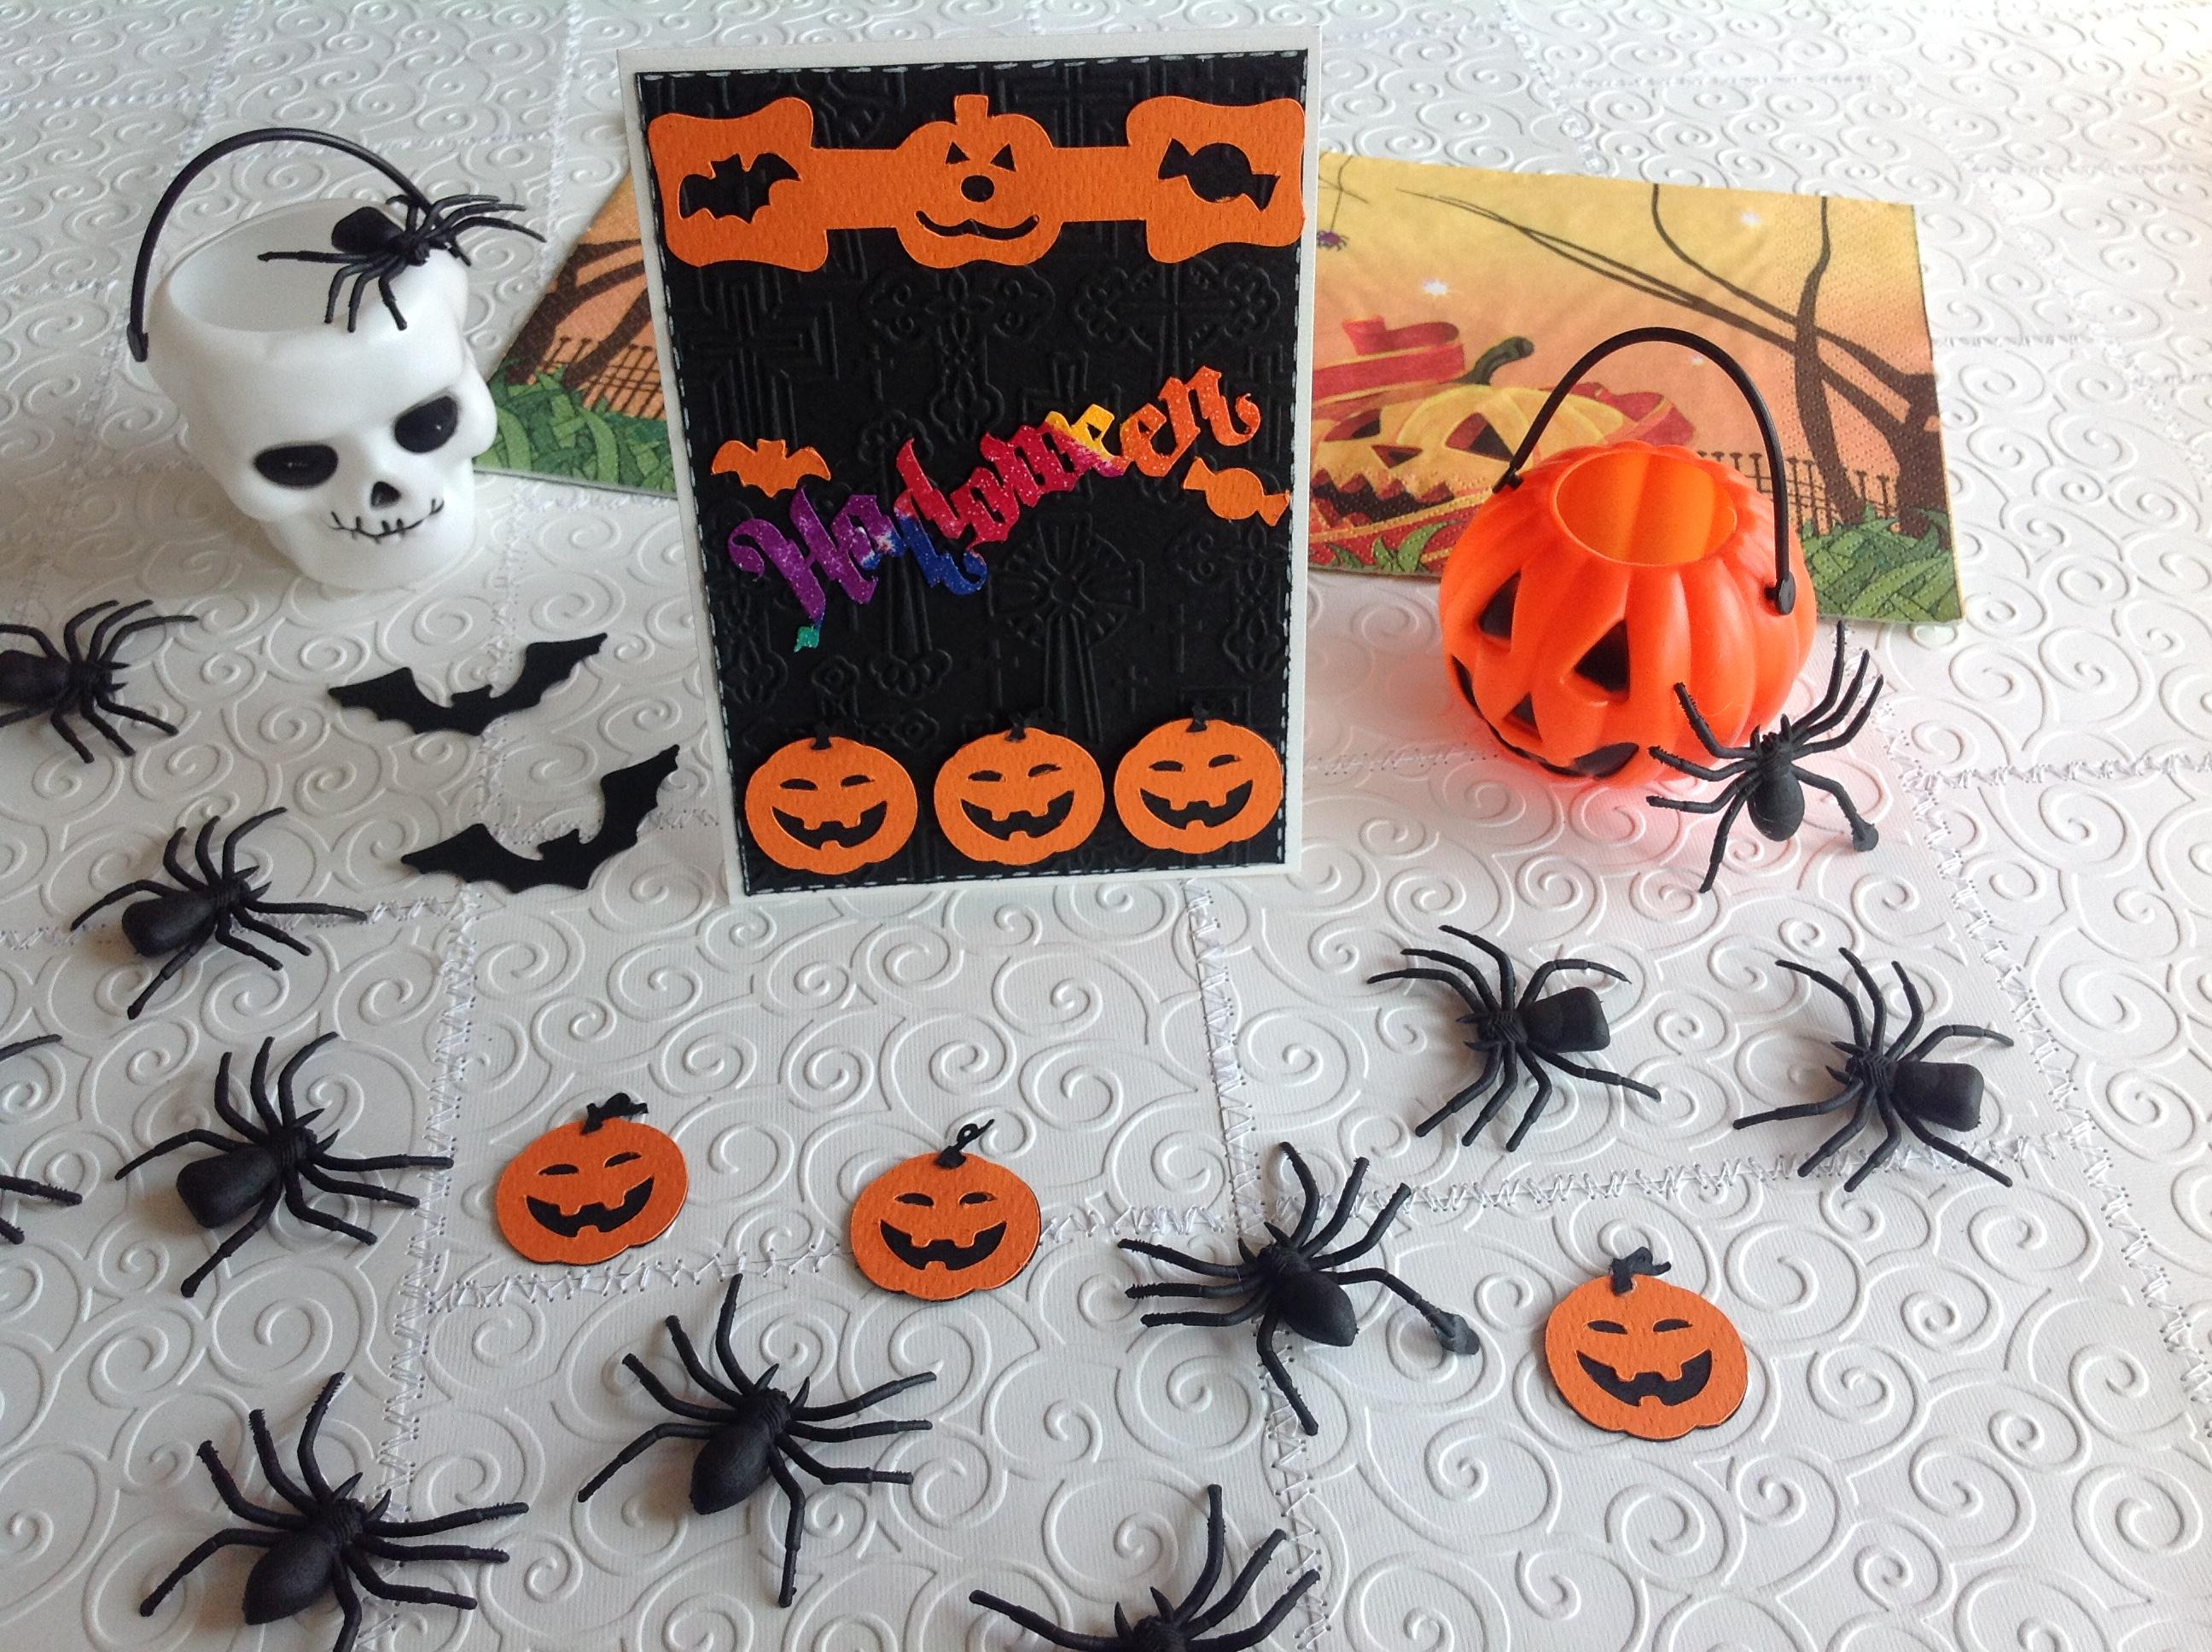 tarjeta-halloween-calabazas-encandoras